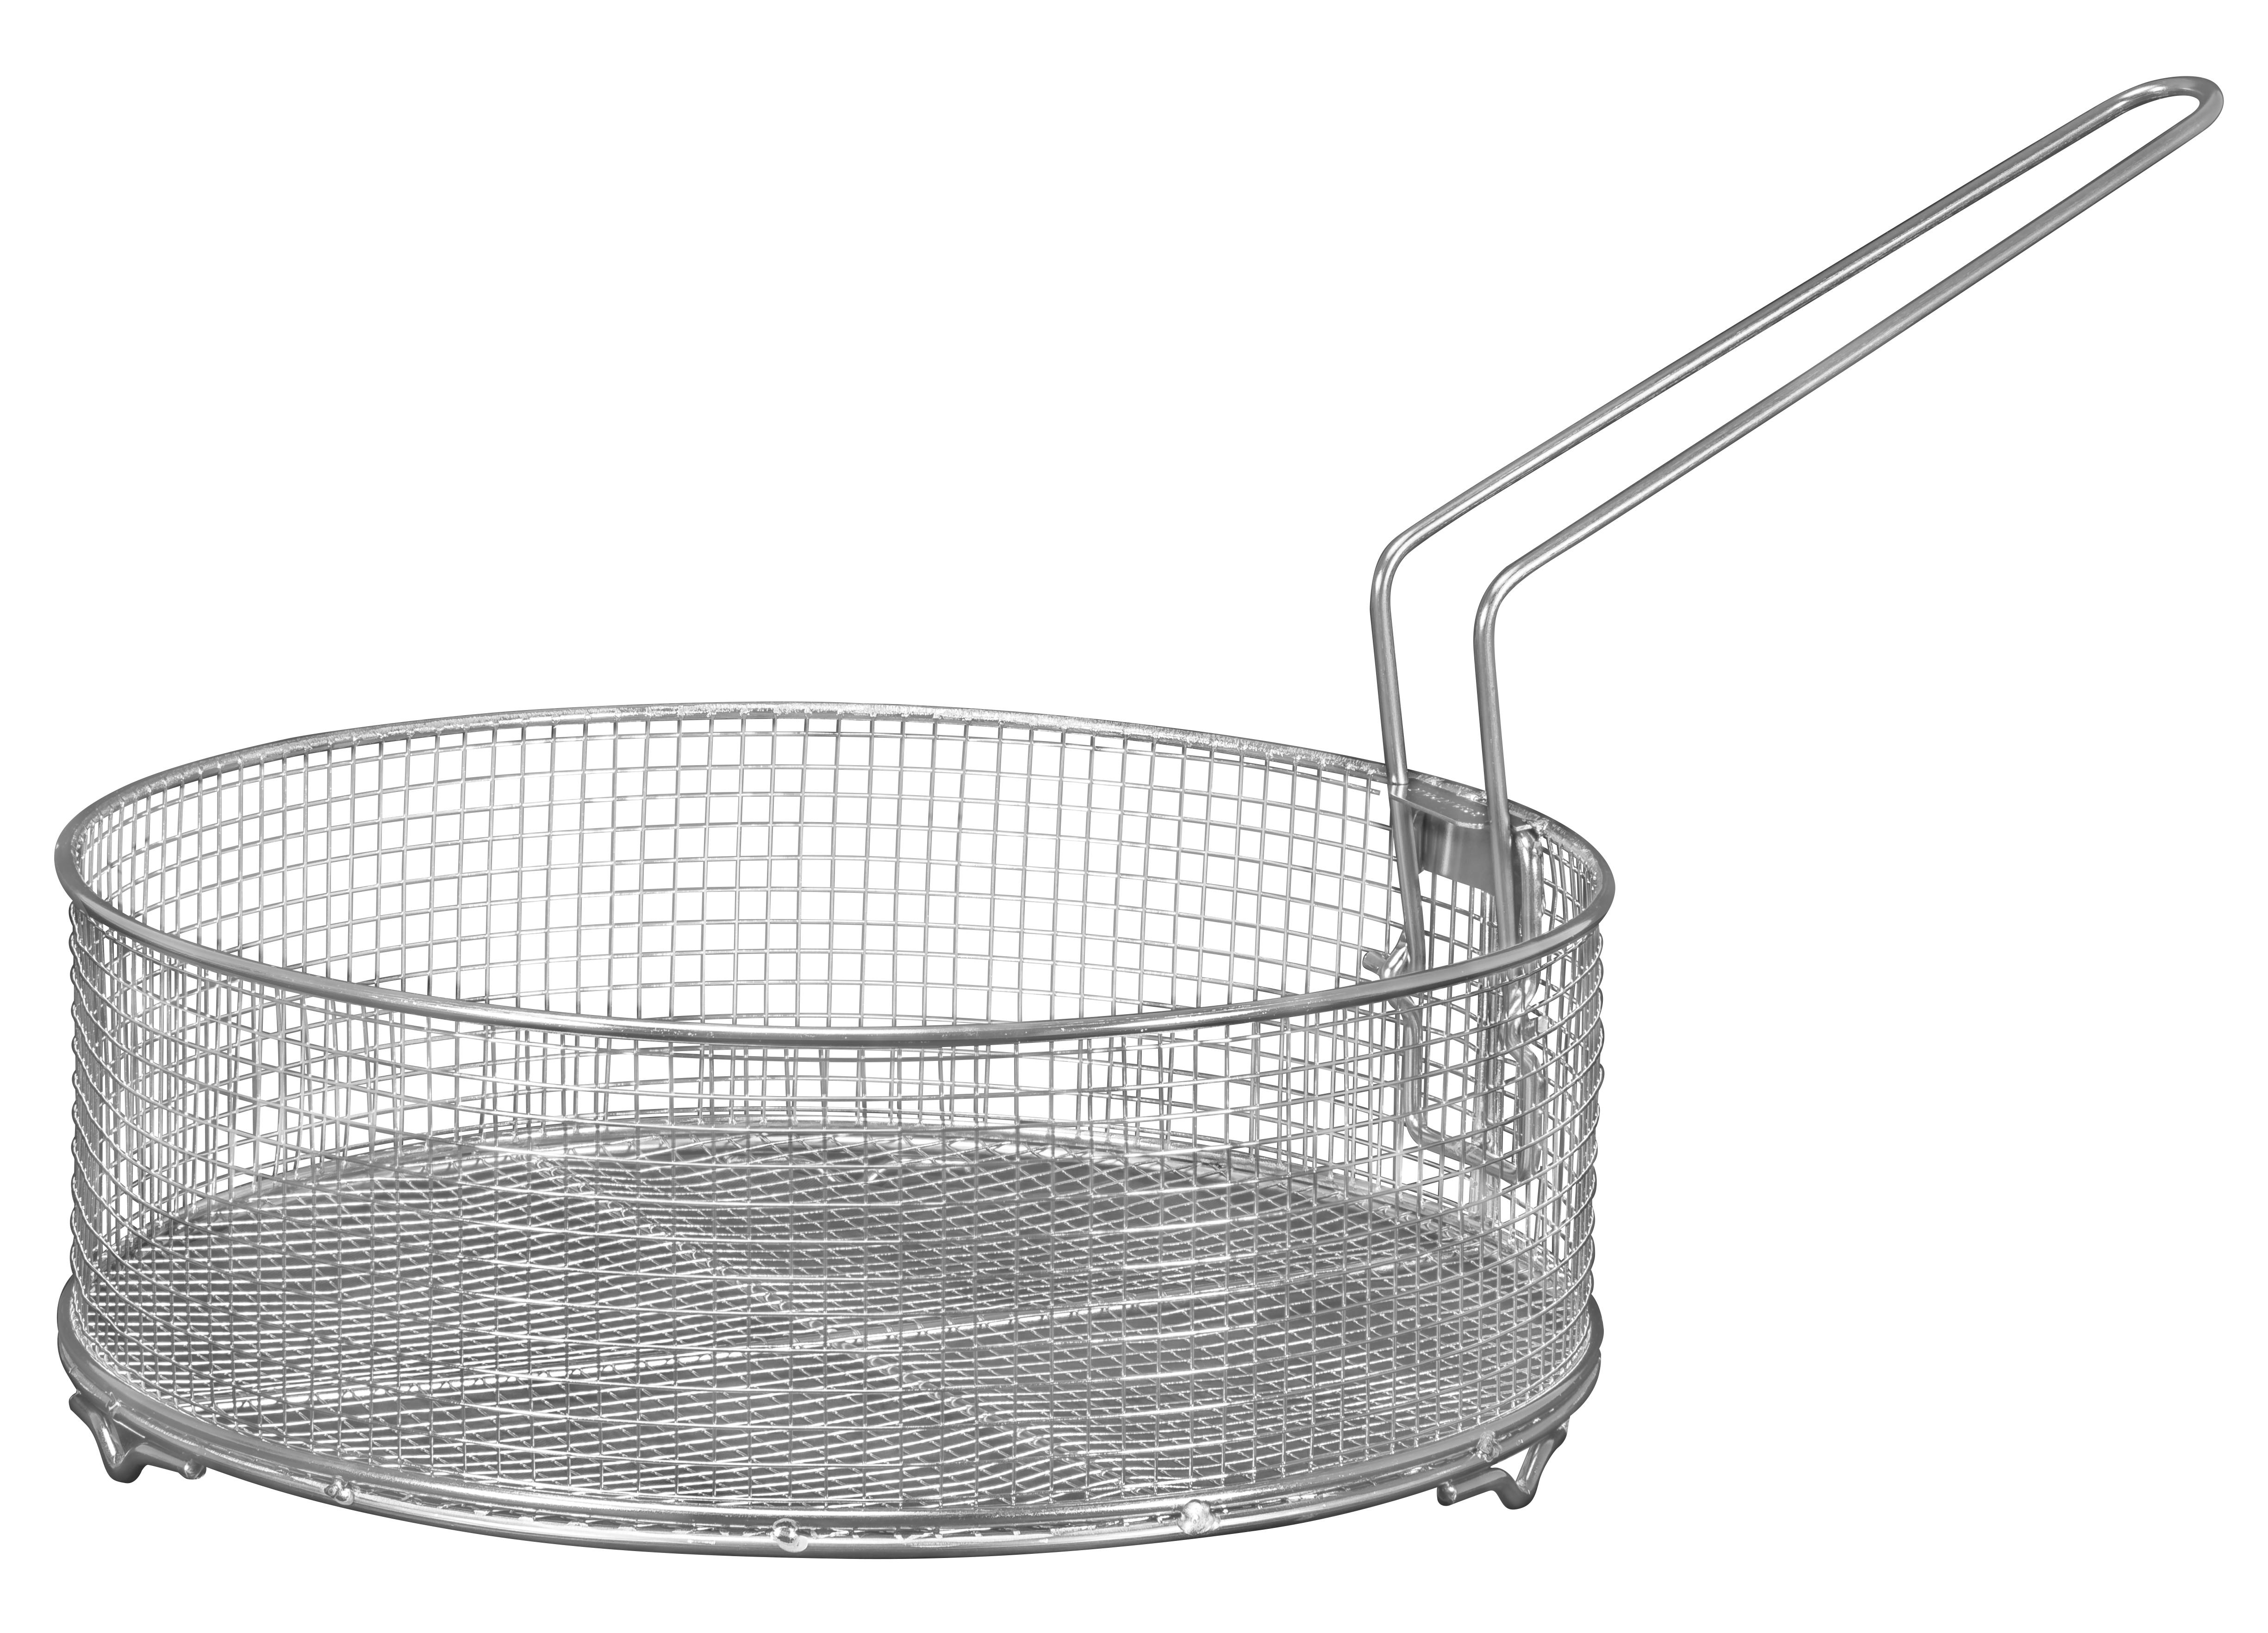 Fry basket 28 cm, TechnIQ, 28cm